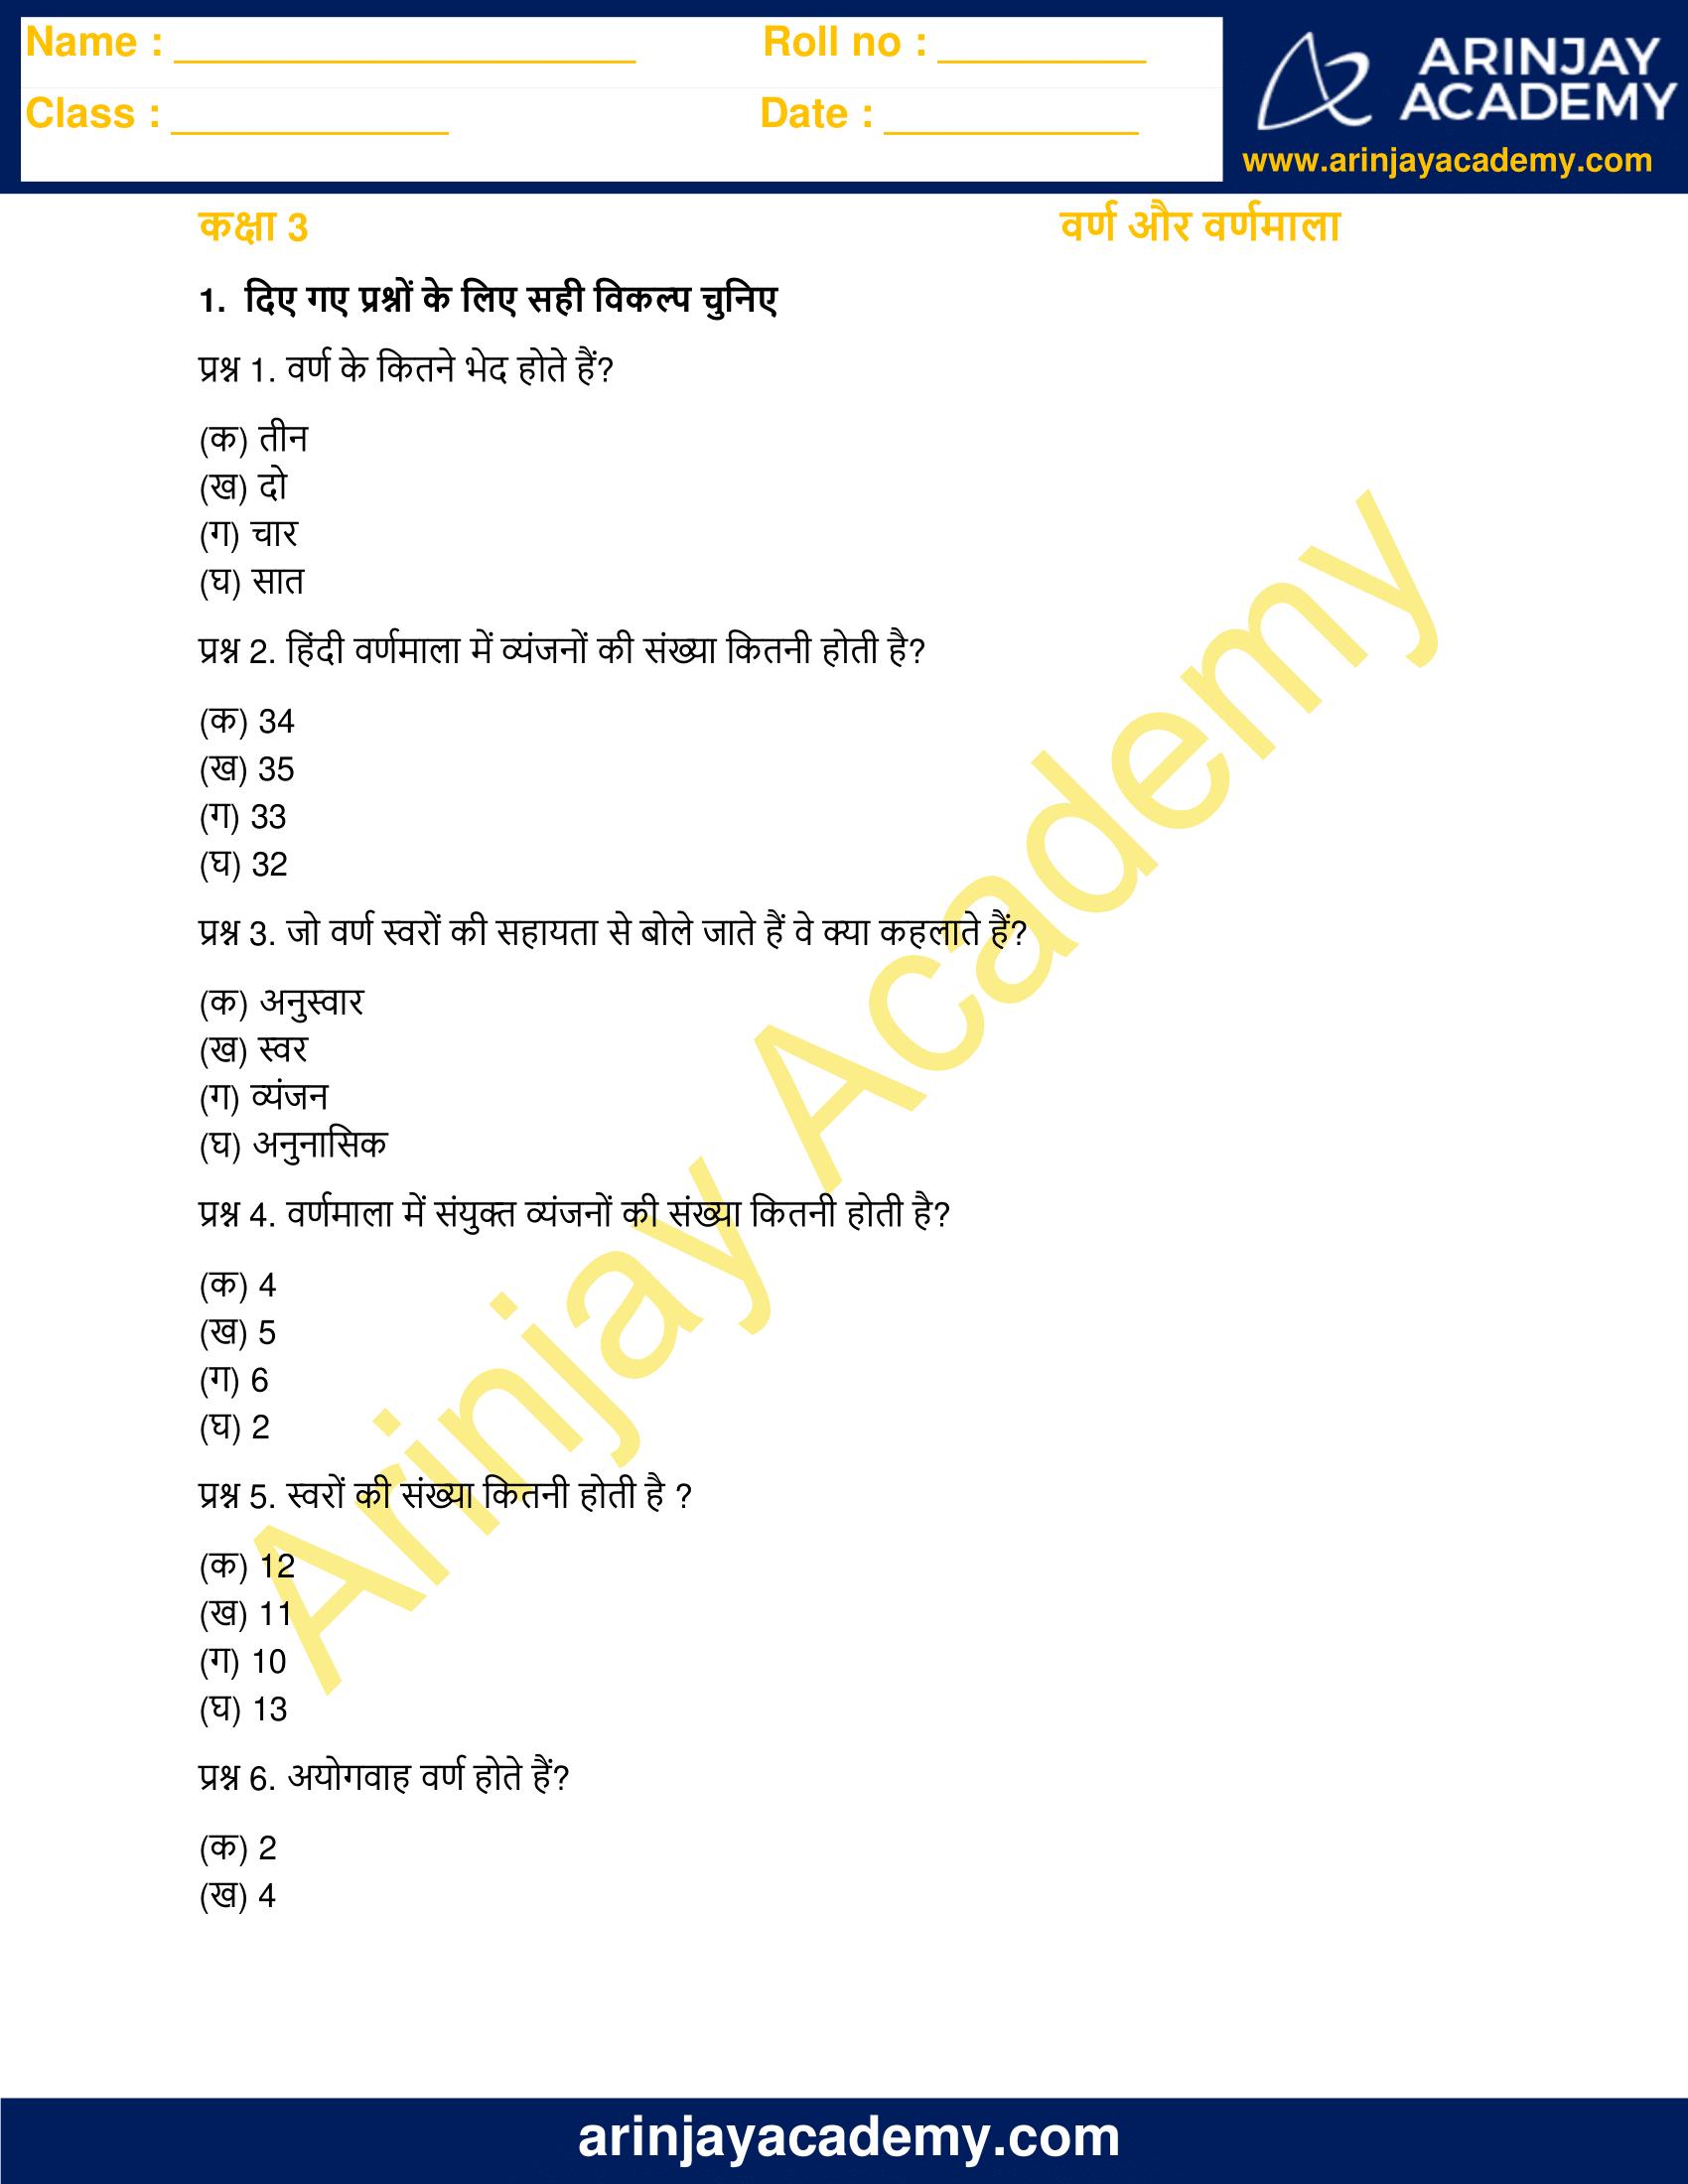 Varn aur Varnamala Worksheet for Class 3 image 1